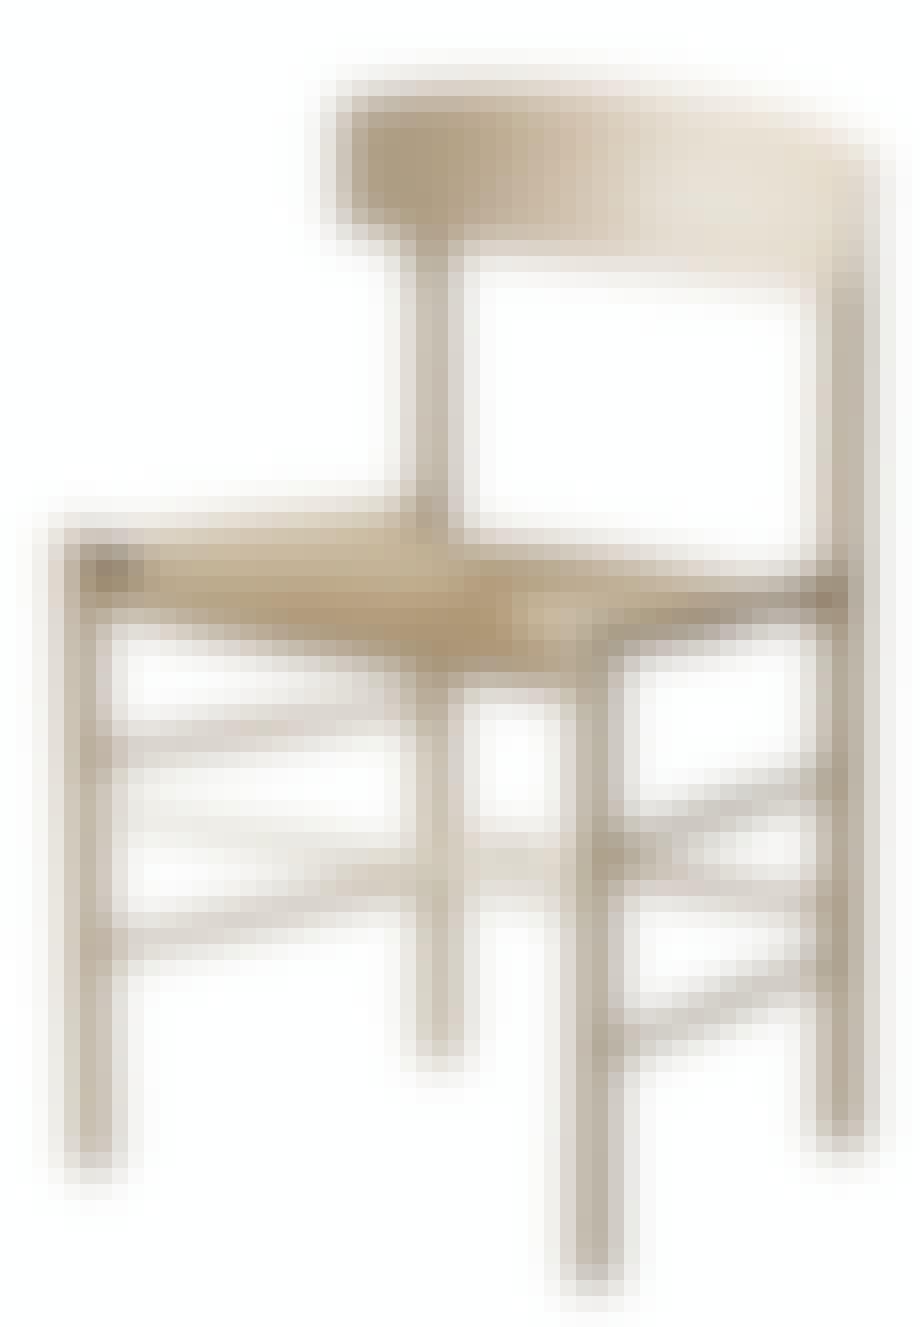 Mogensens berømte J39-træstol